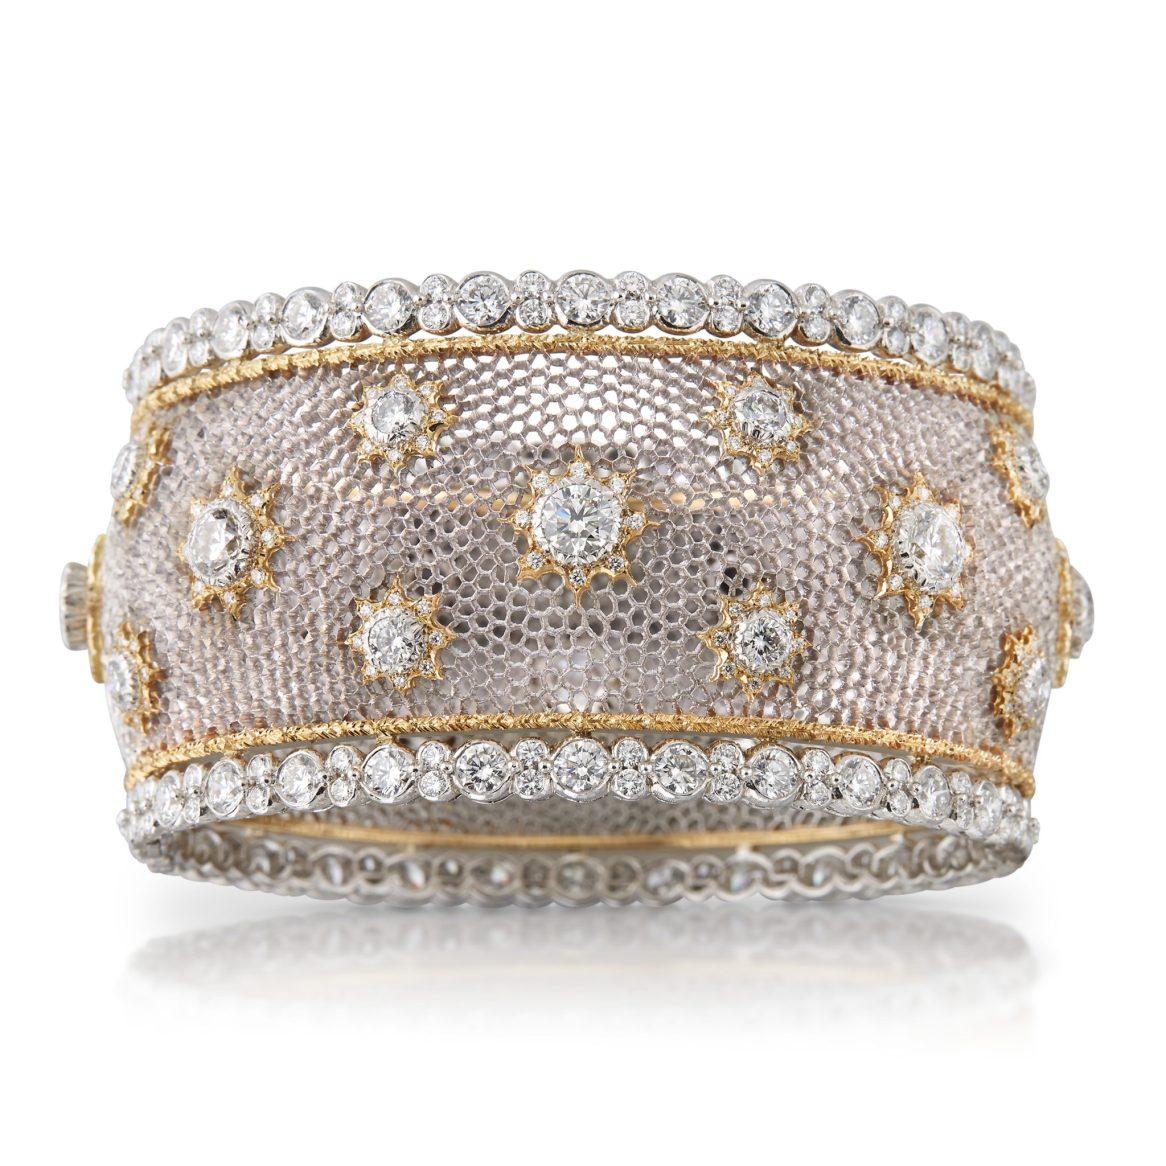 Volta Celeste bracelet T5583